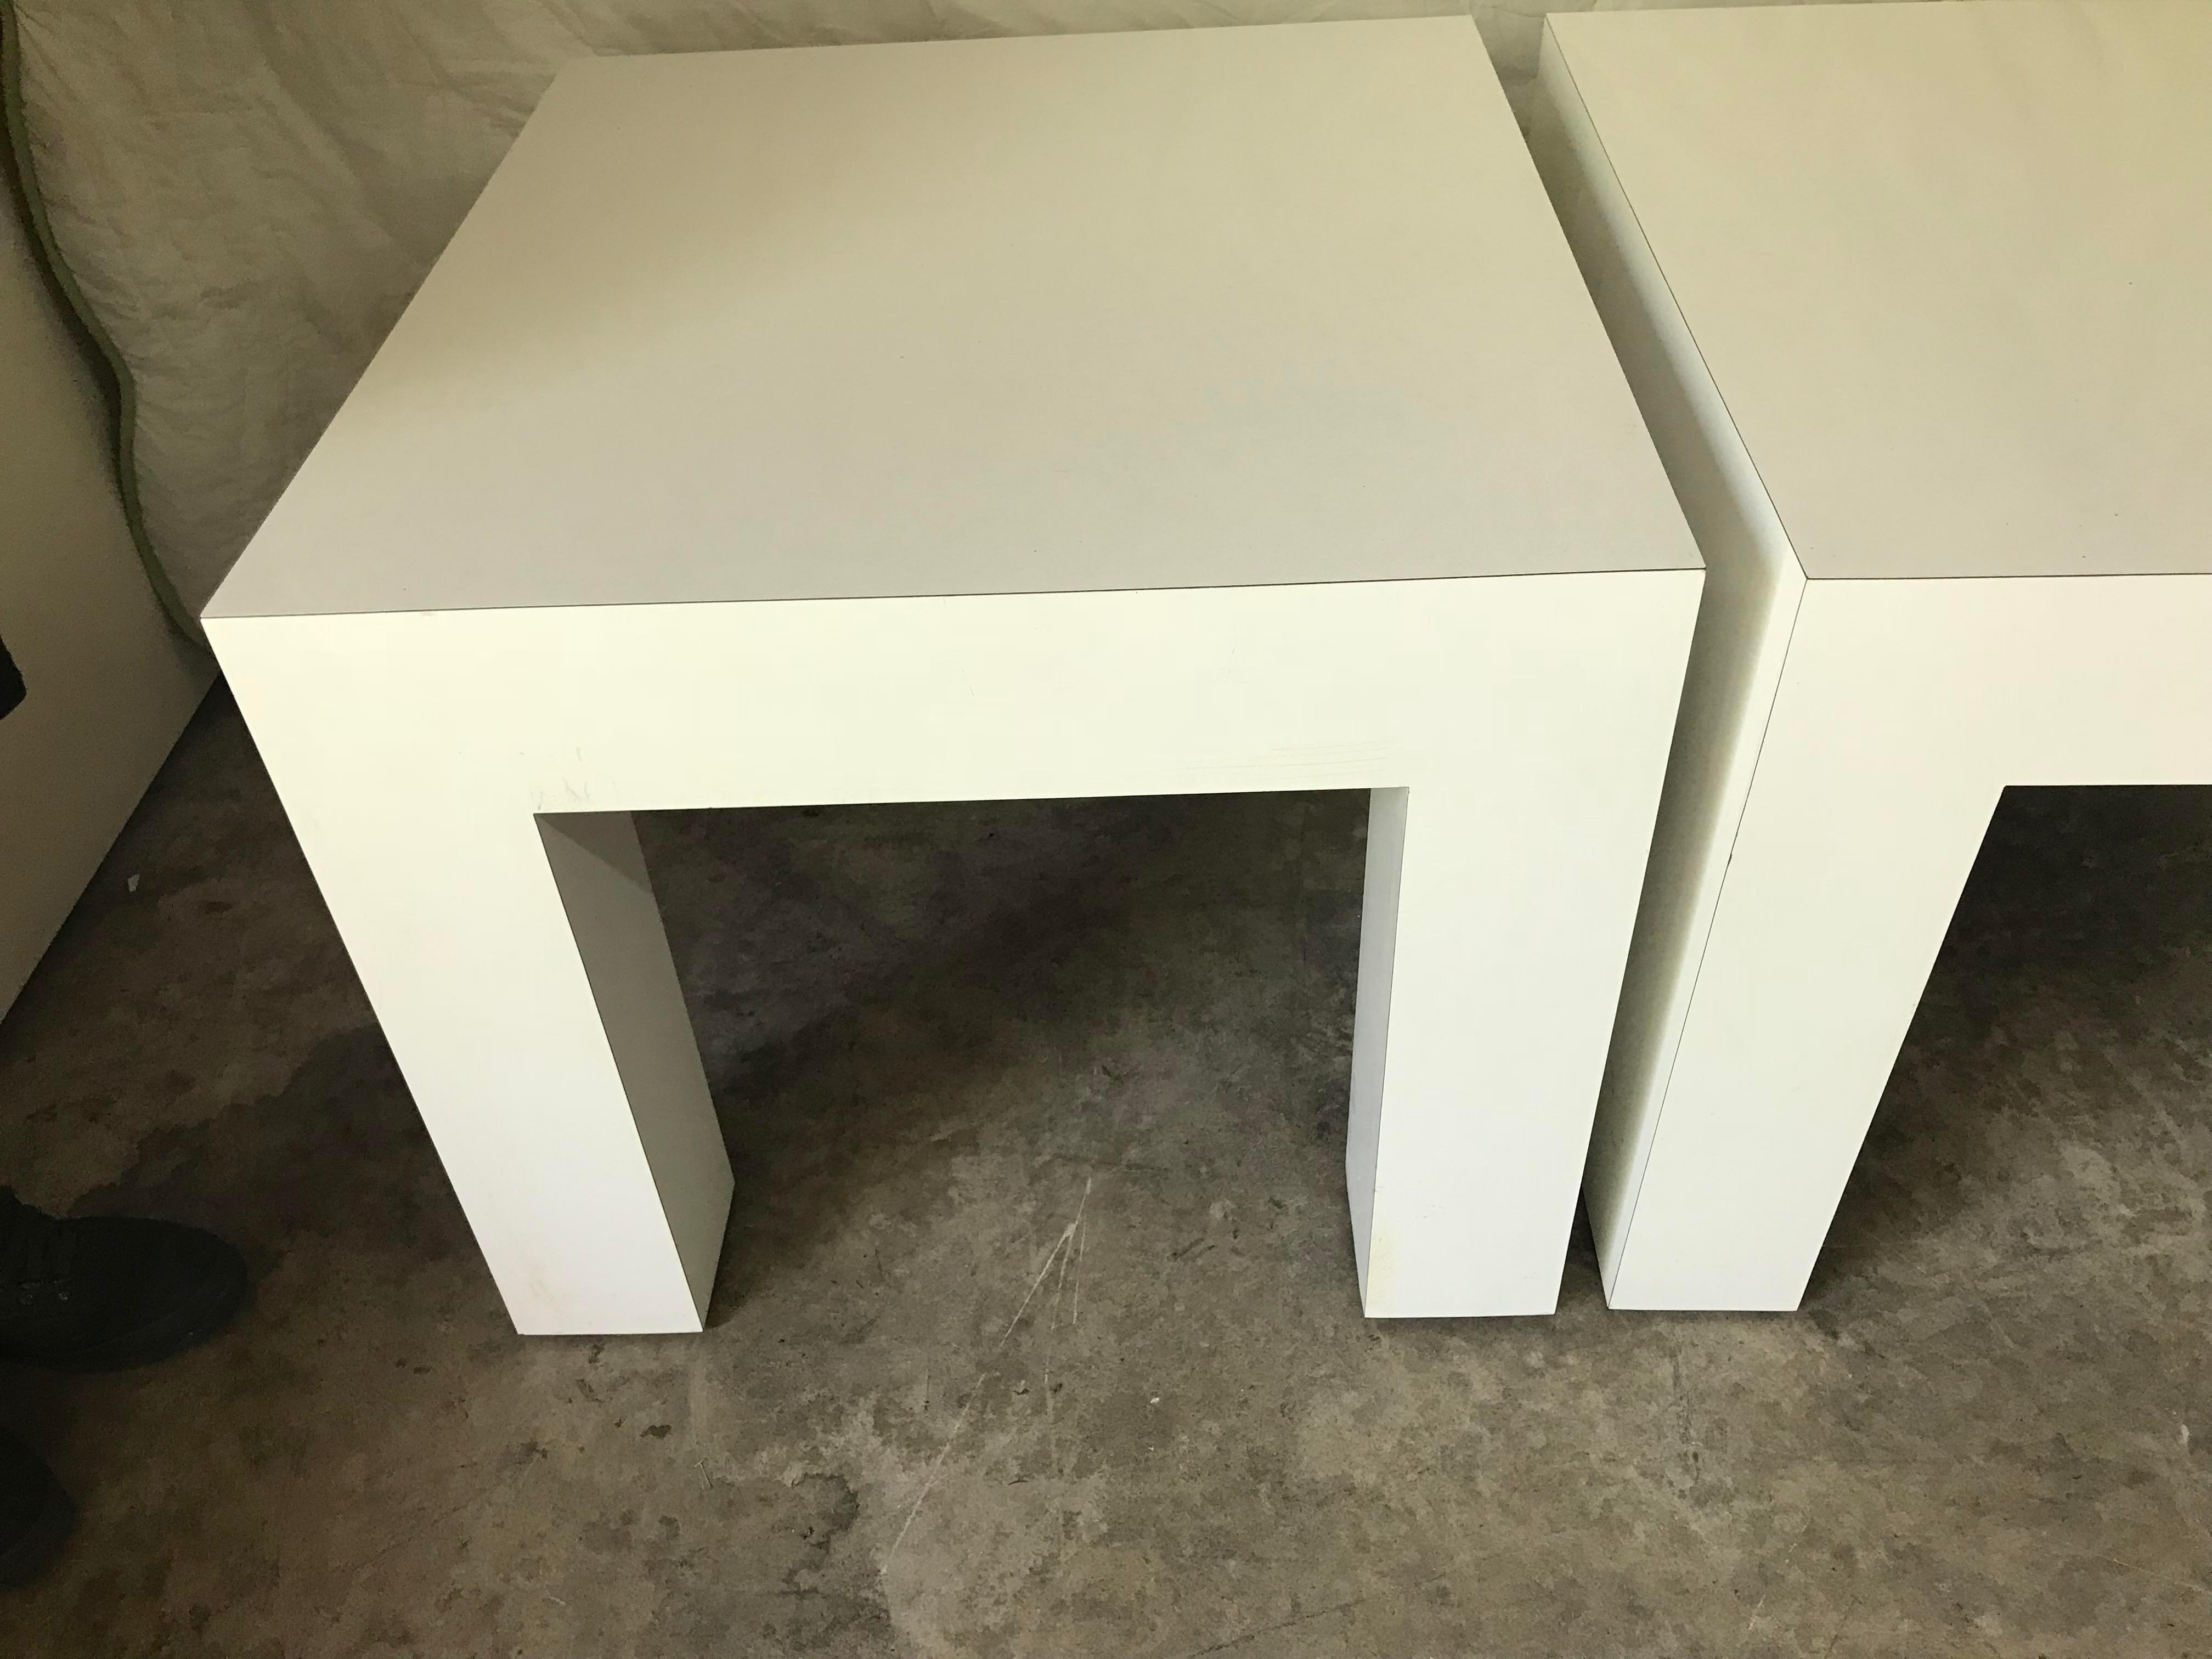 Vintage Mod White Laminate Parsons Tables   A Pair   Image 4 Of 5